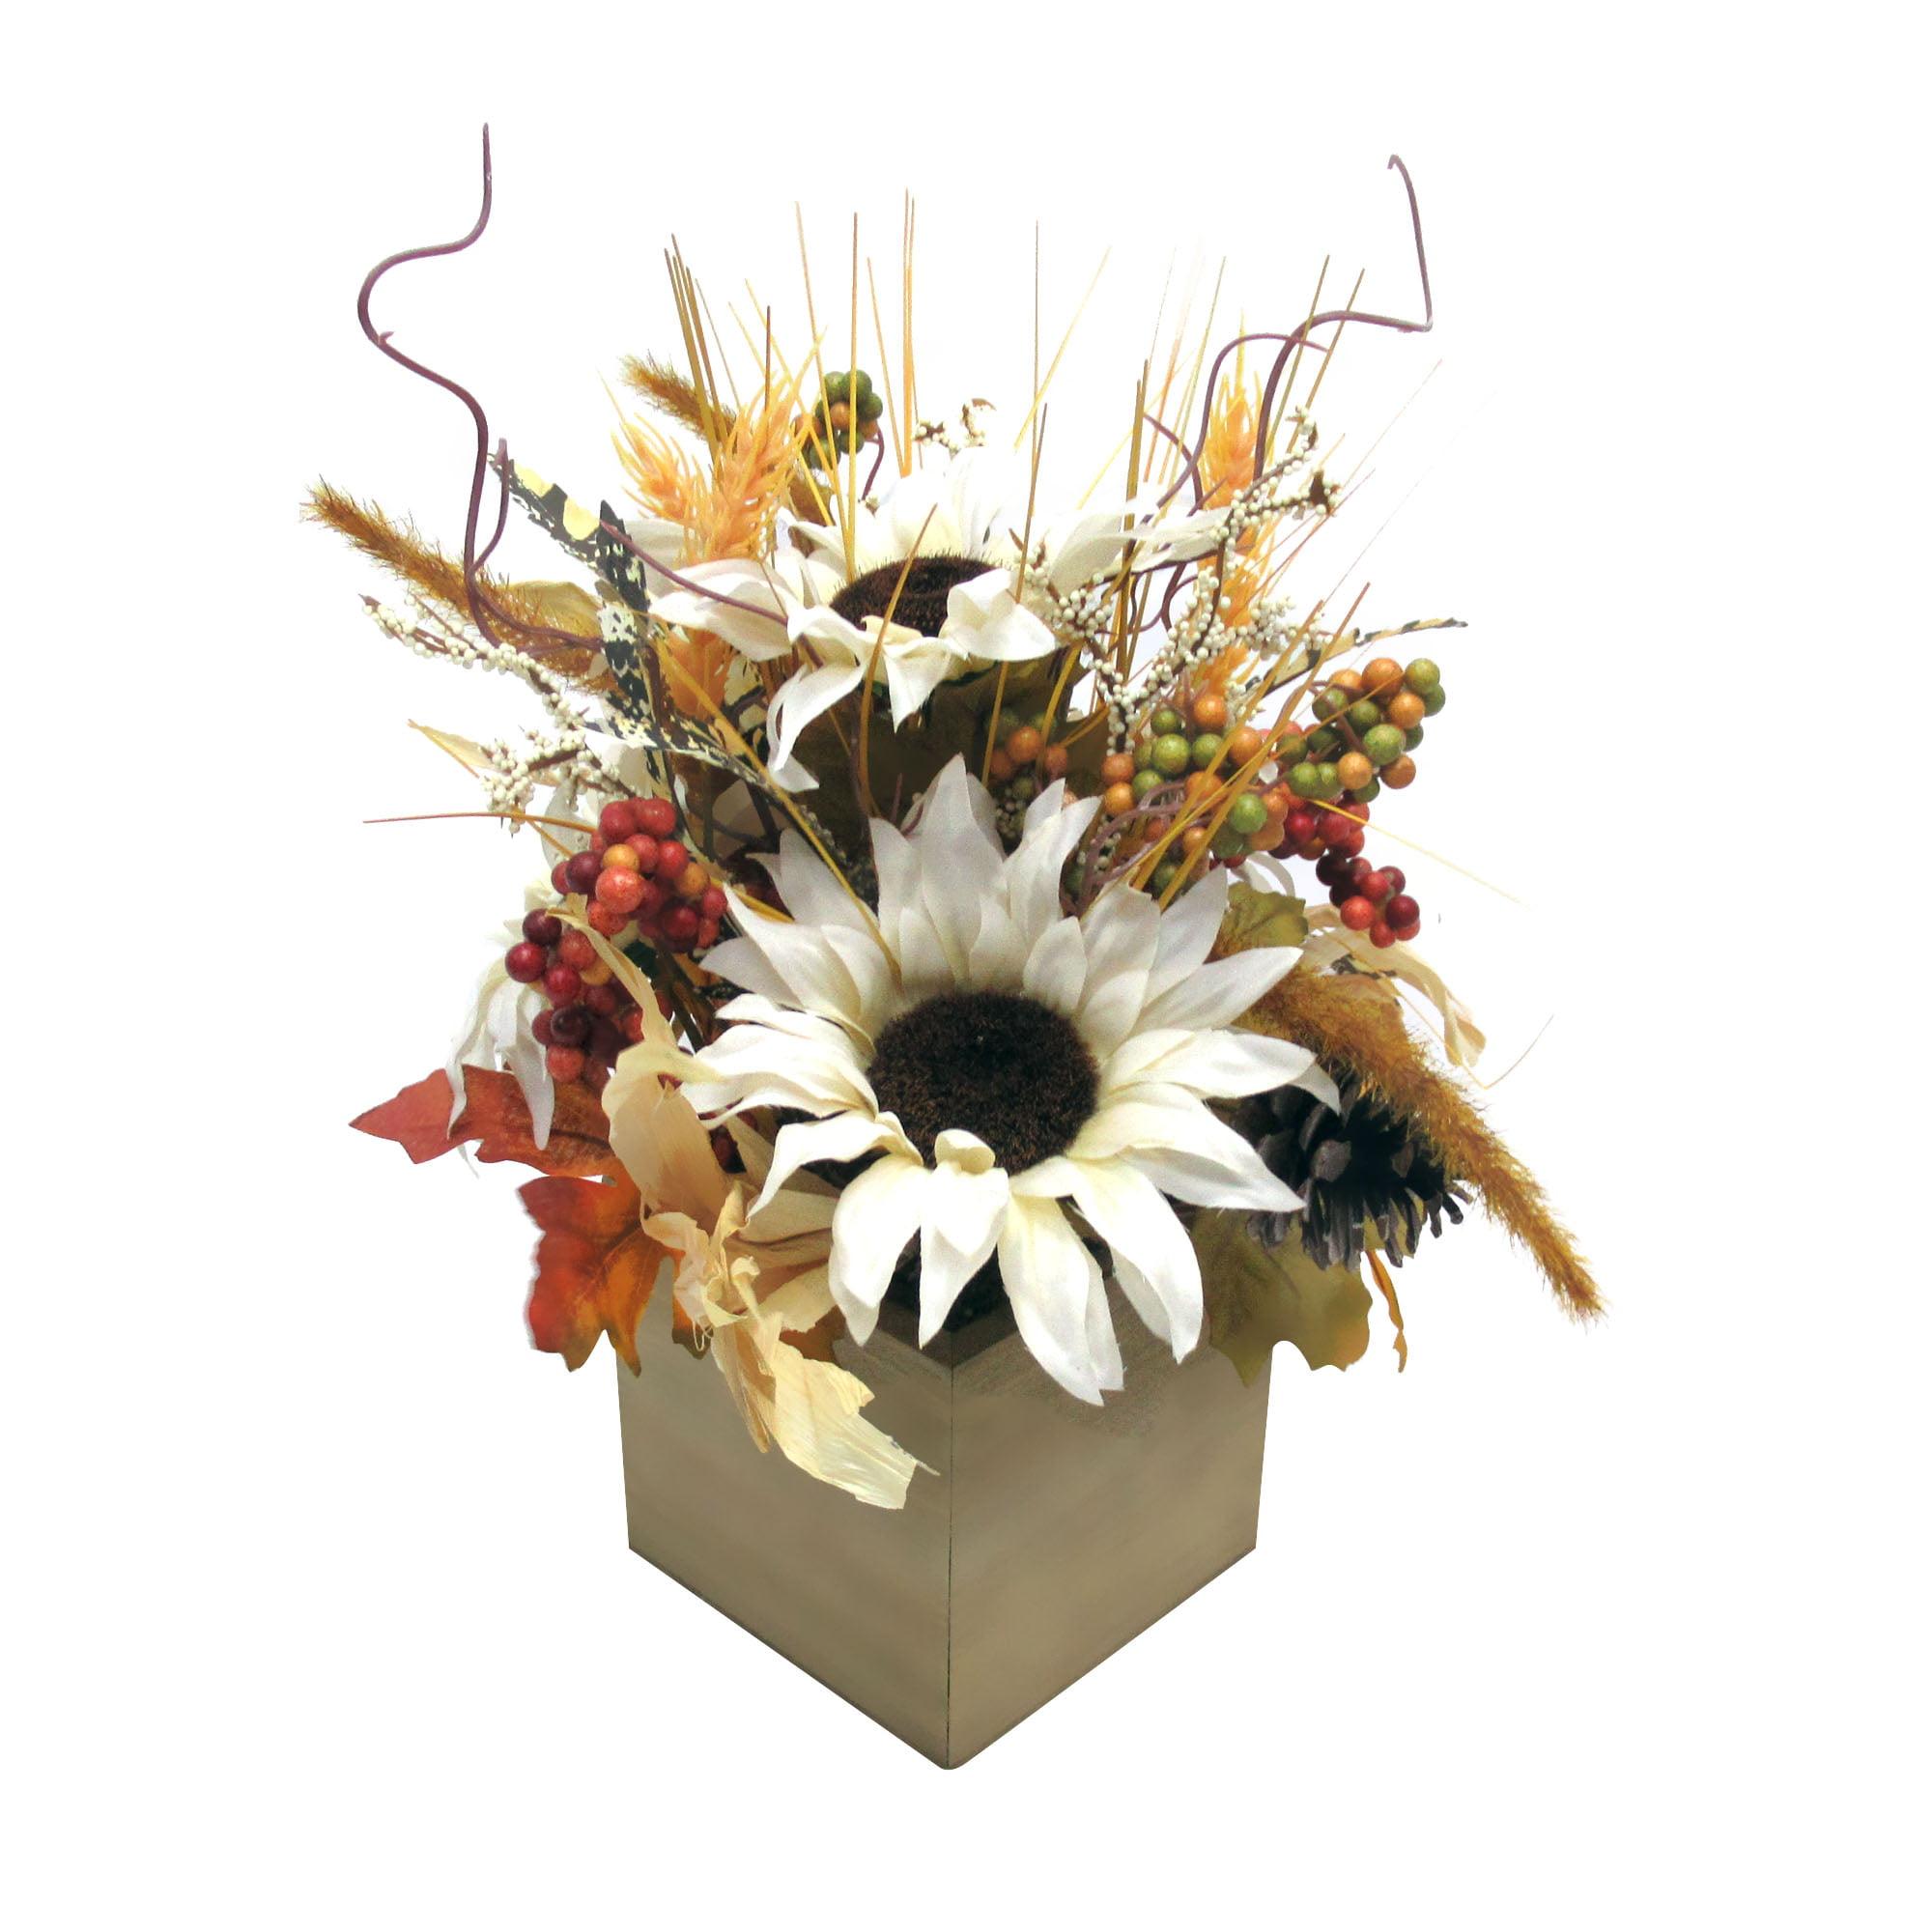 "Mainstays Harvest Faux Sunflower Foral Centerpiece, 9.5"" x 7"" x 13"" - Walmart.com"